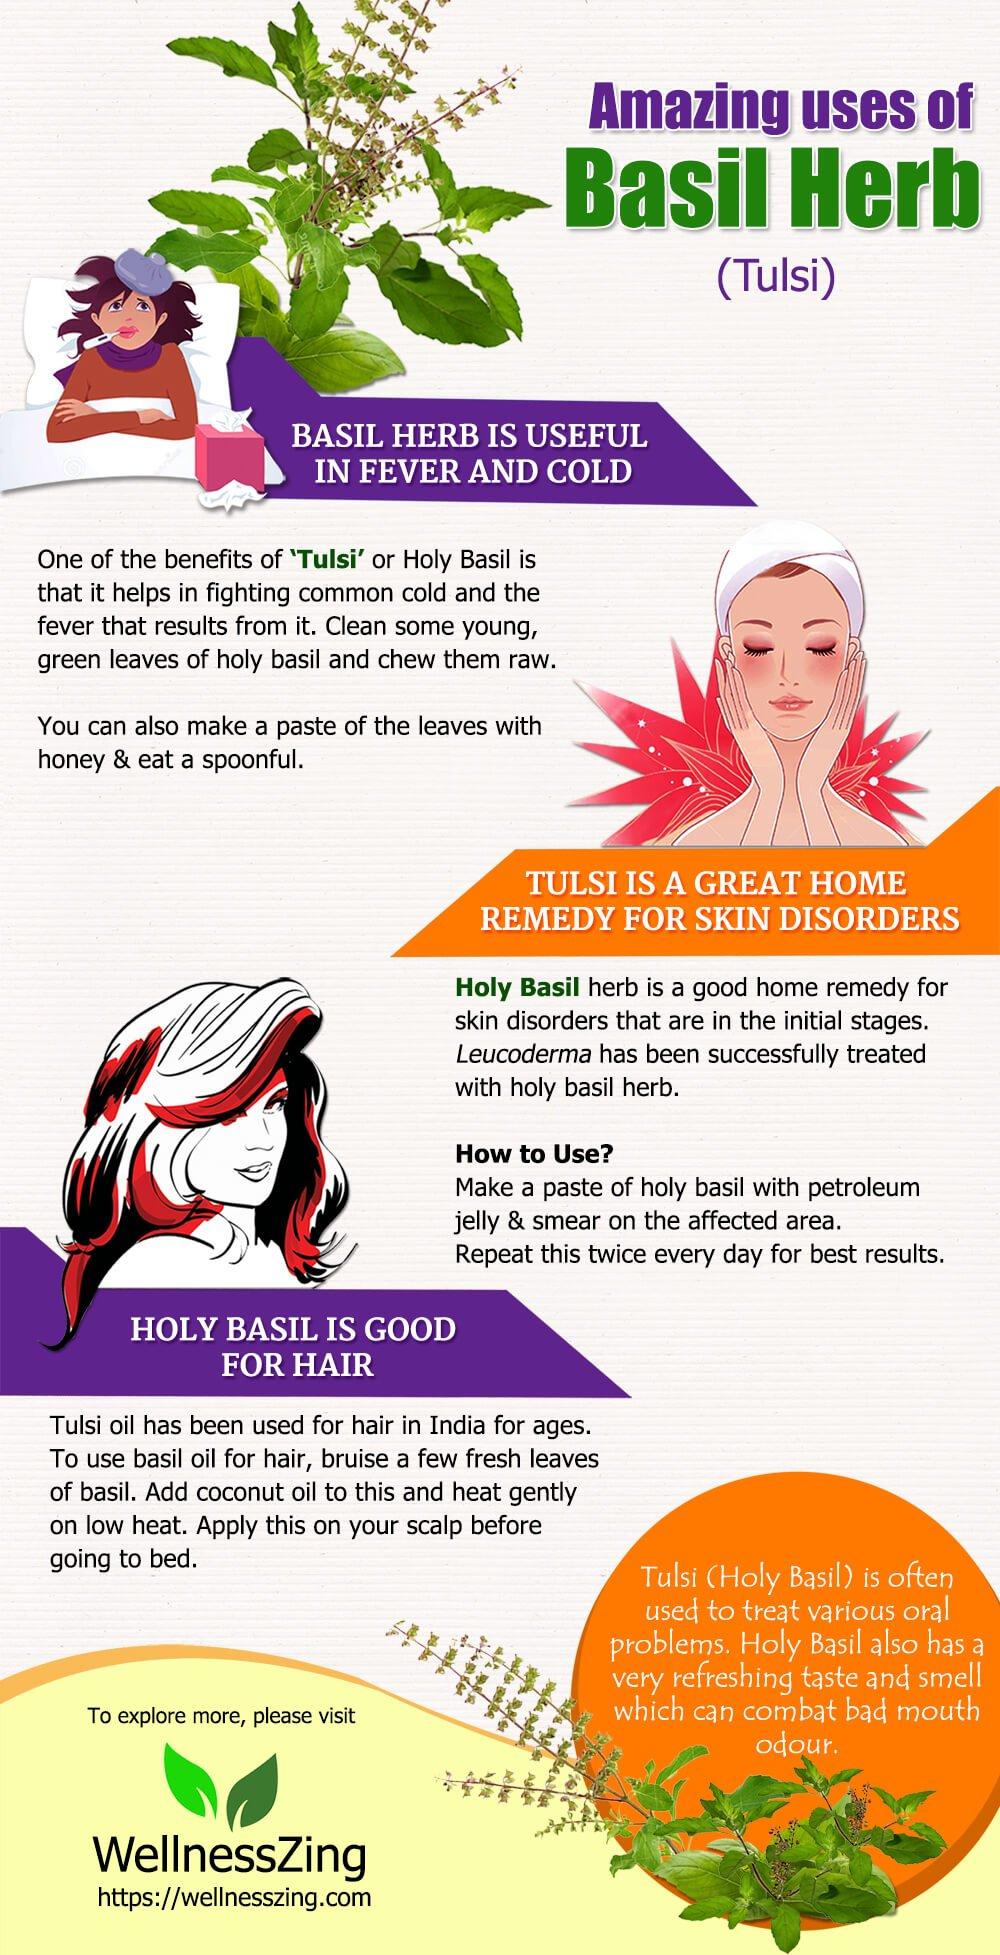 Uses of Holy Basil or Tulsi